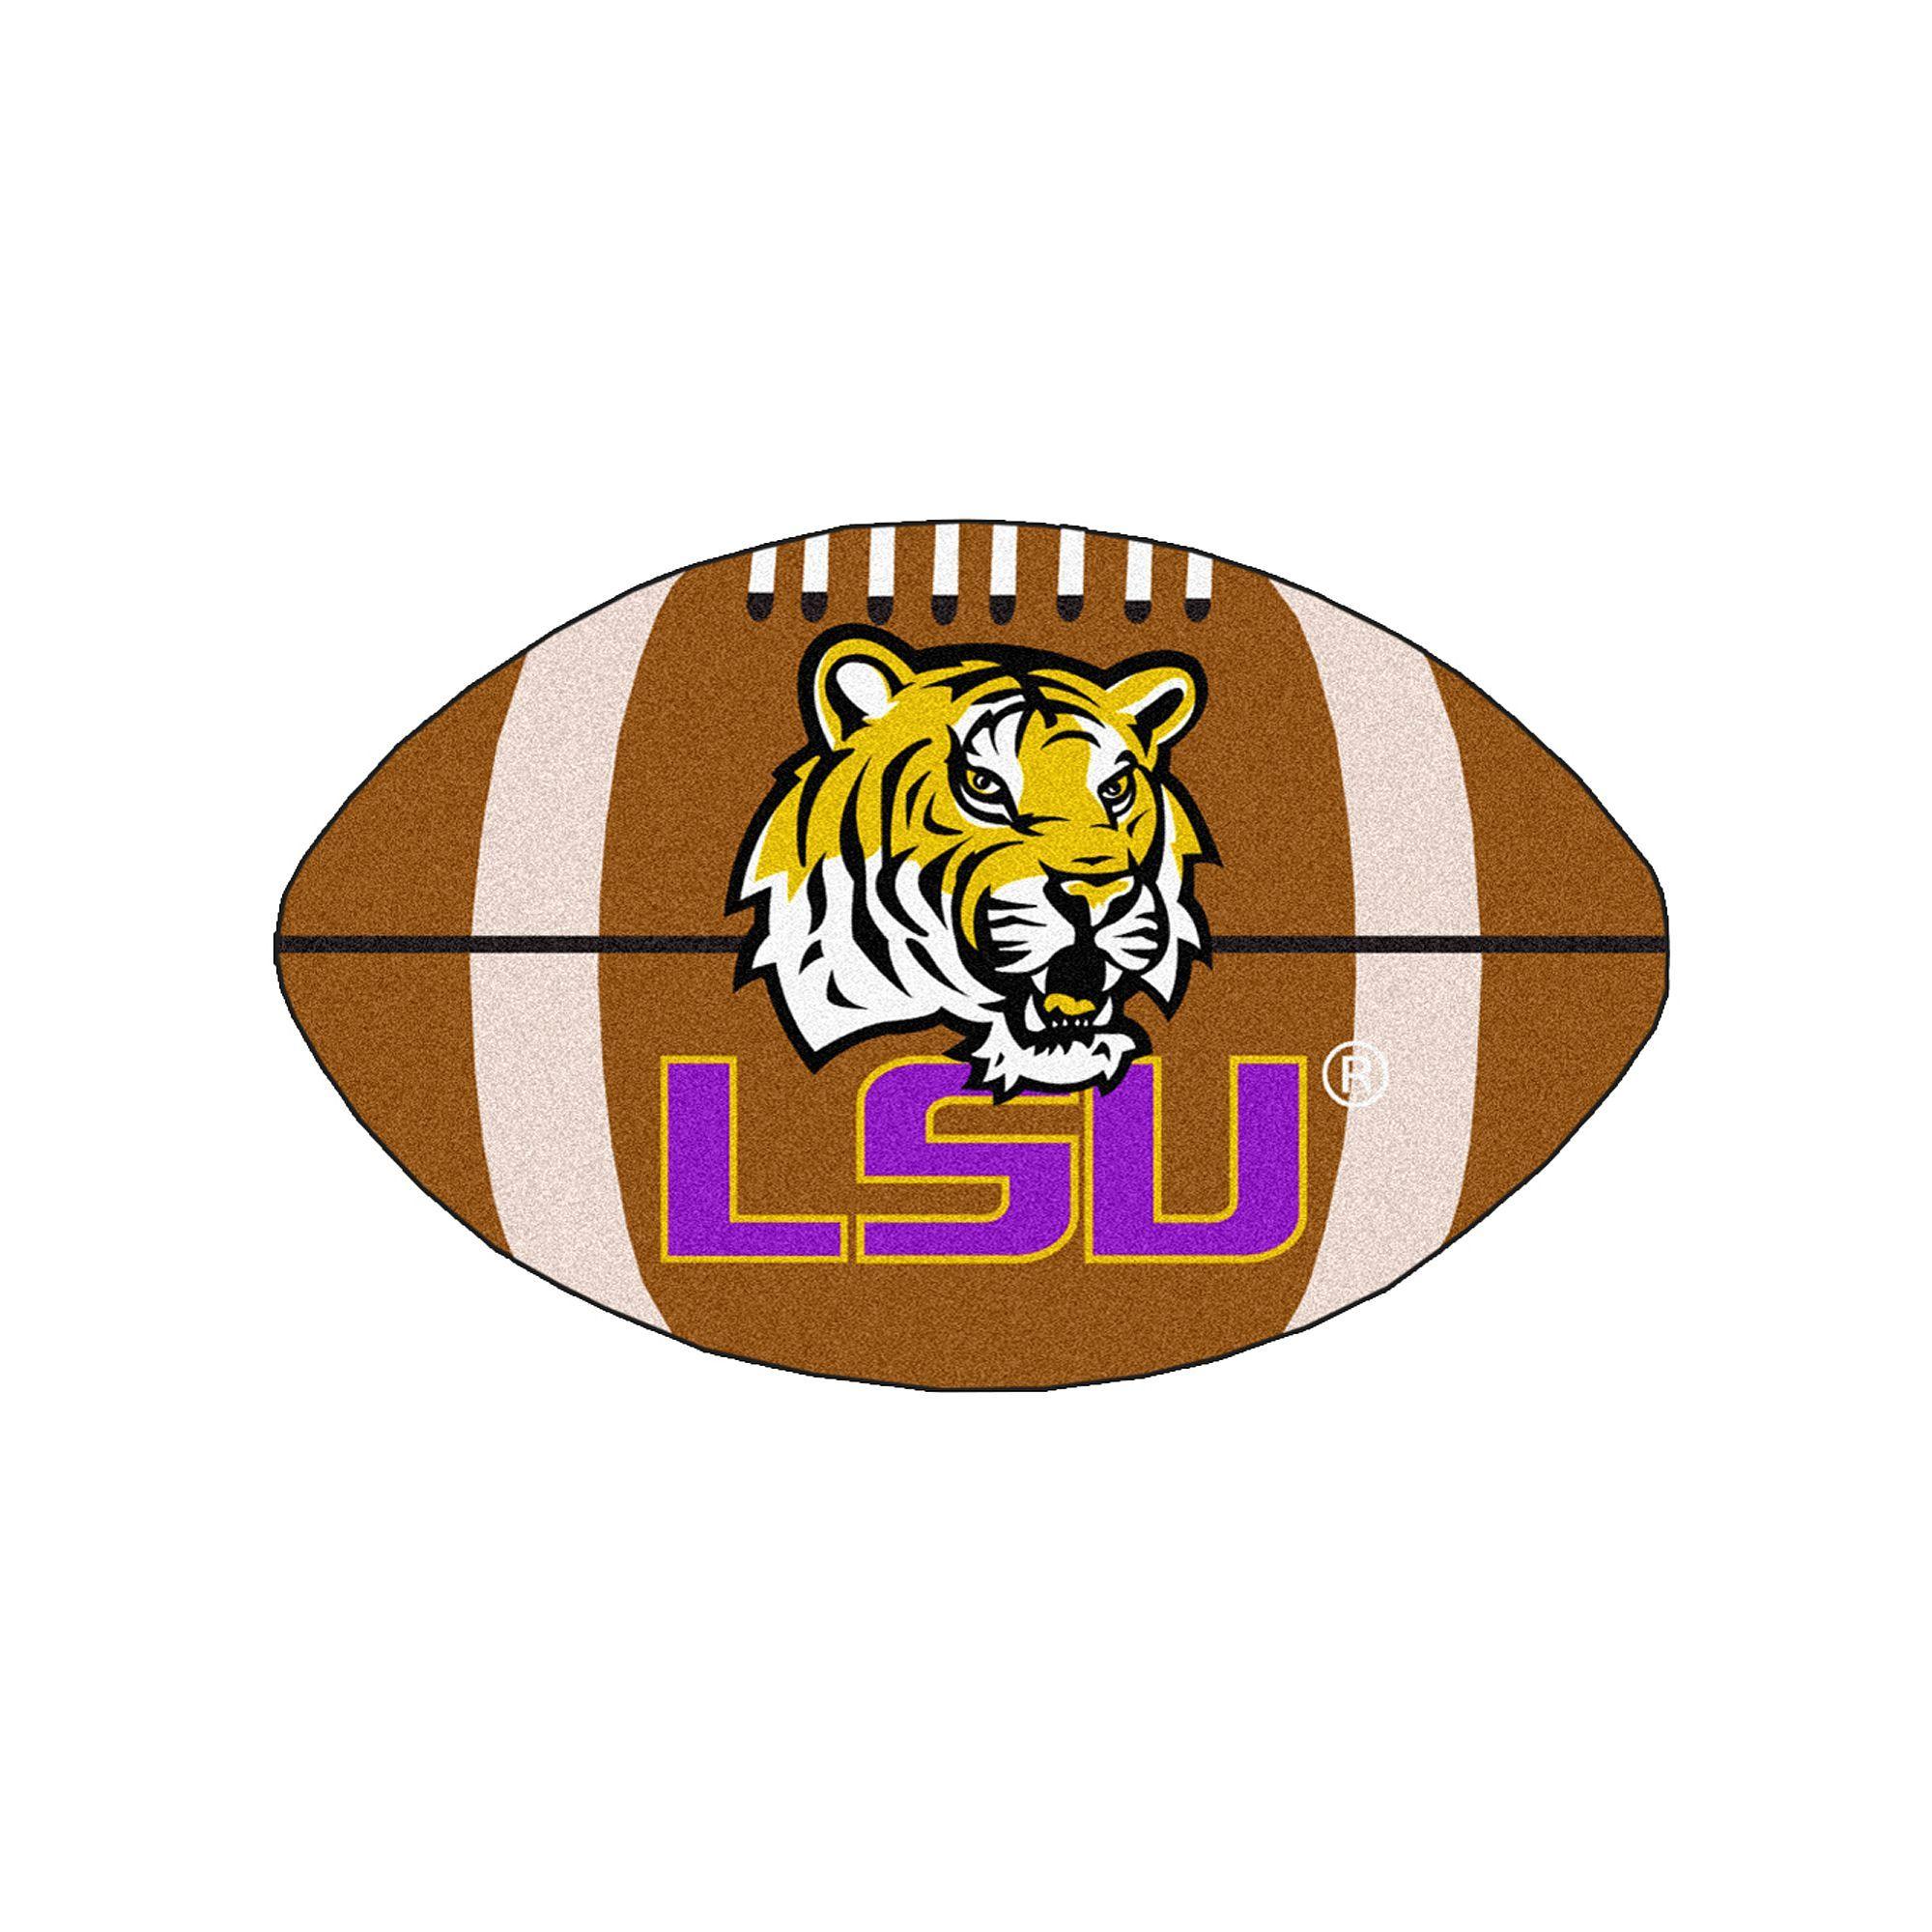 Fanmats Louisiana State Tigers Football Rug, Multicolor